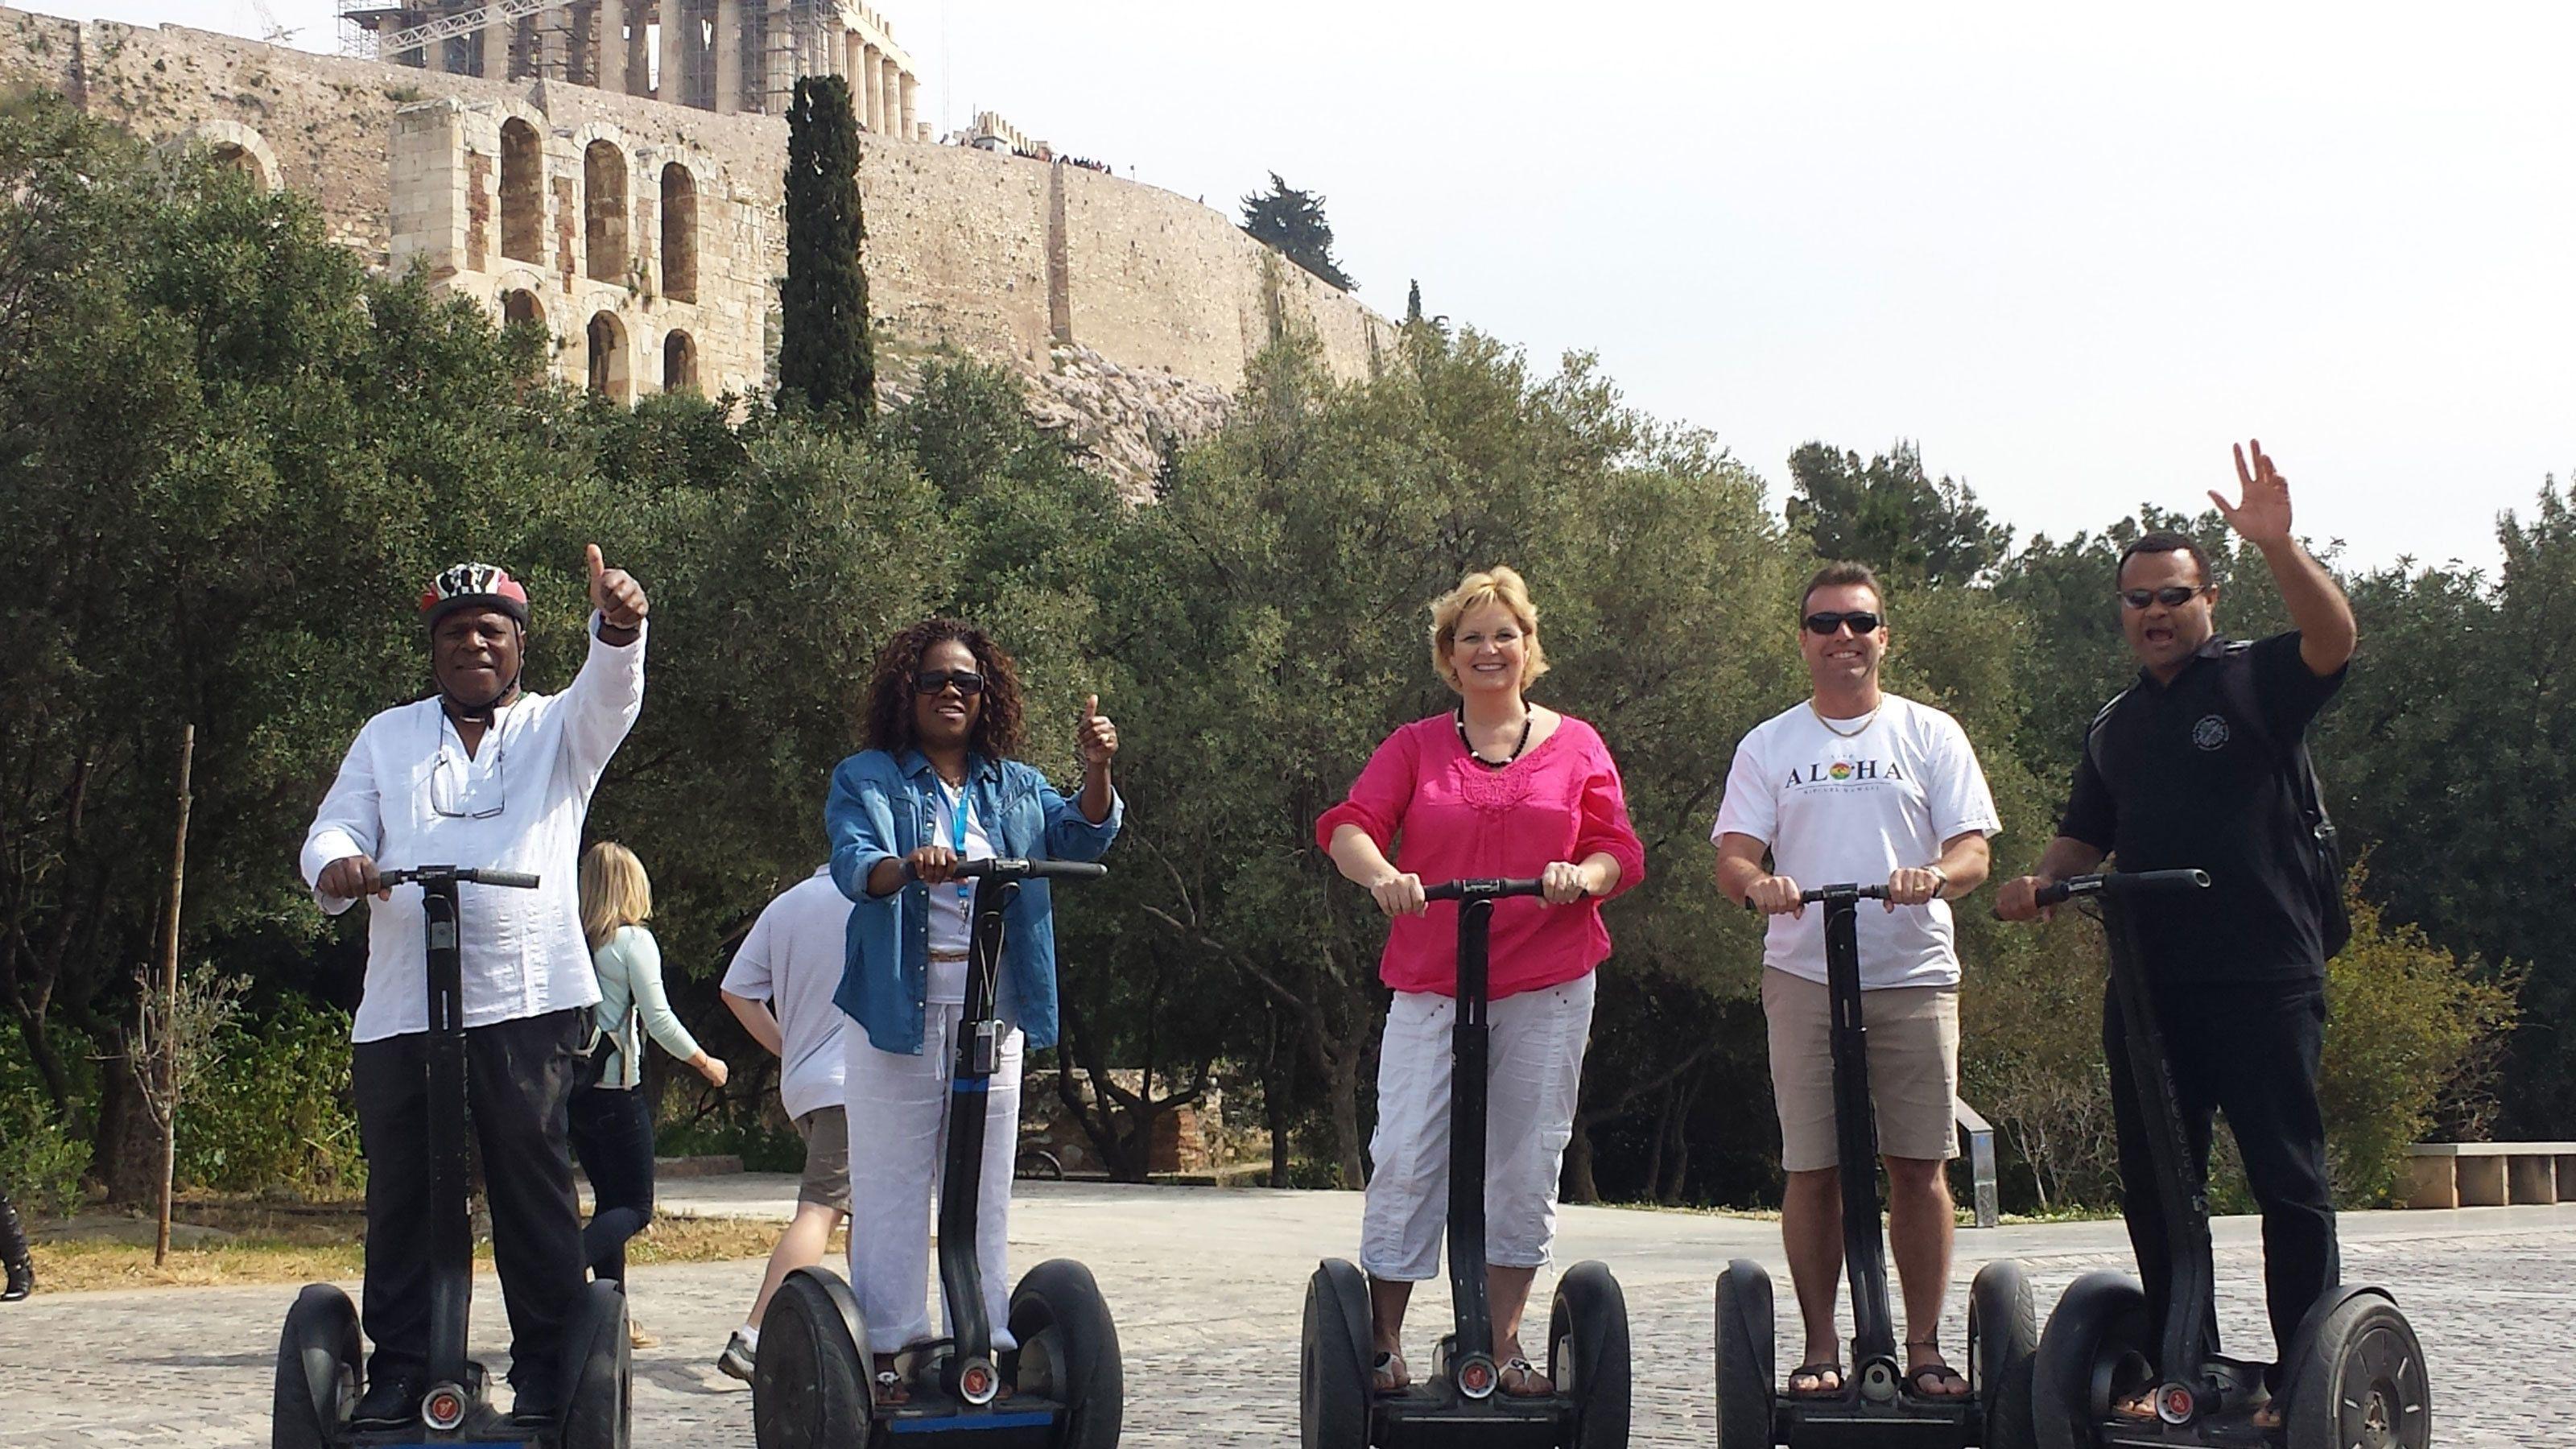 Segway-kiertoajelu Ateenassa